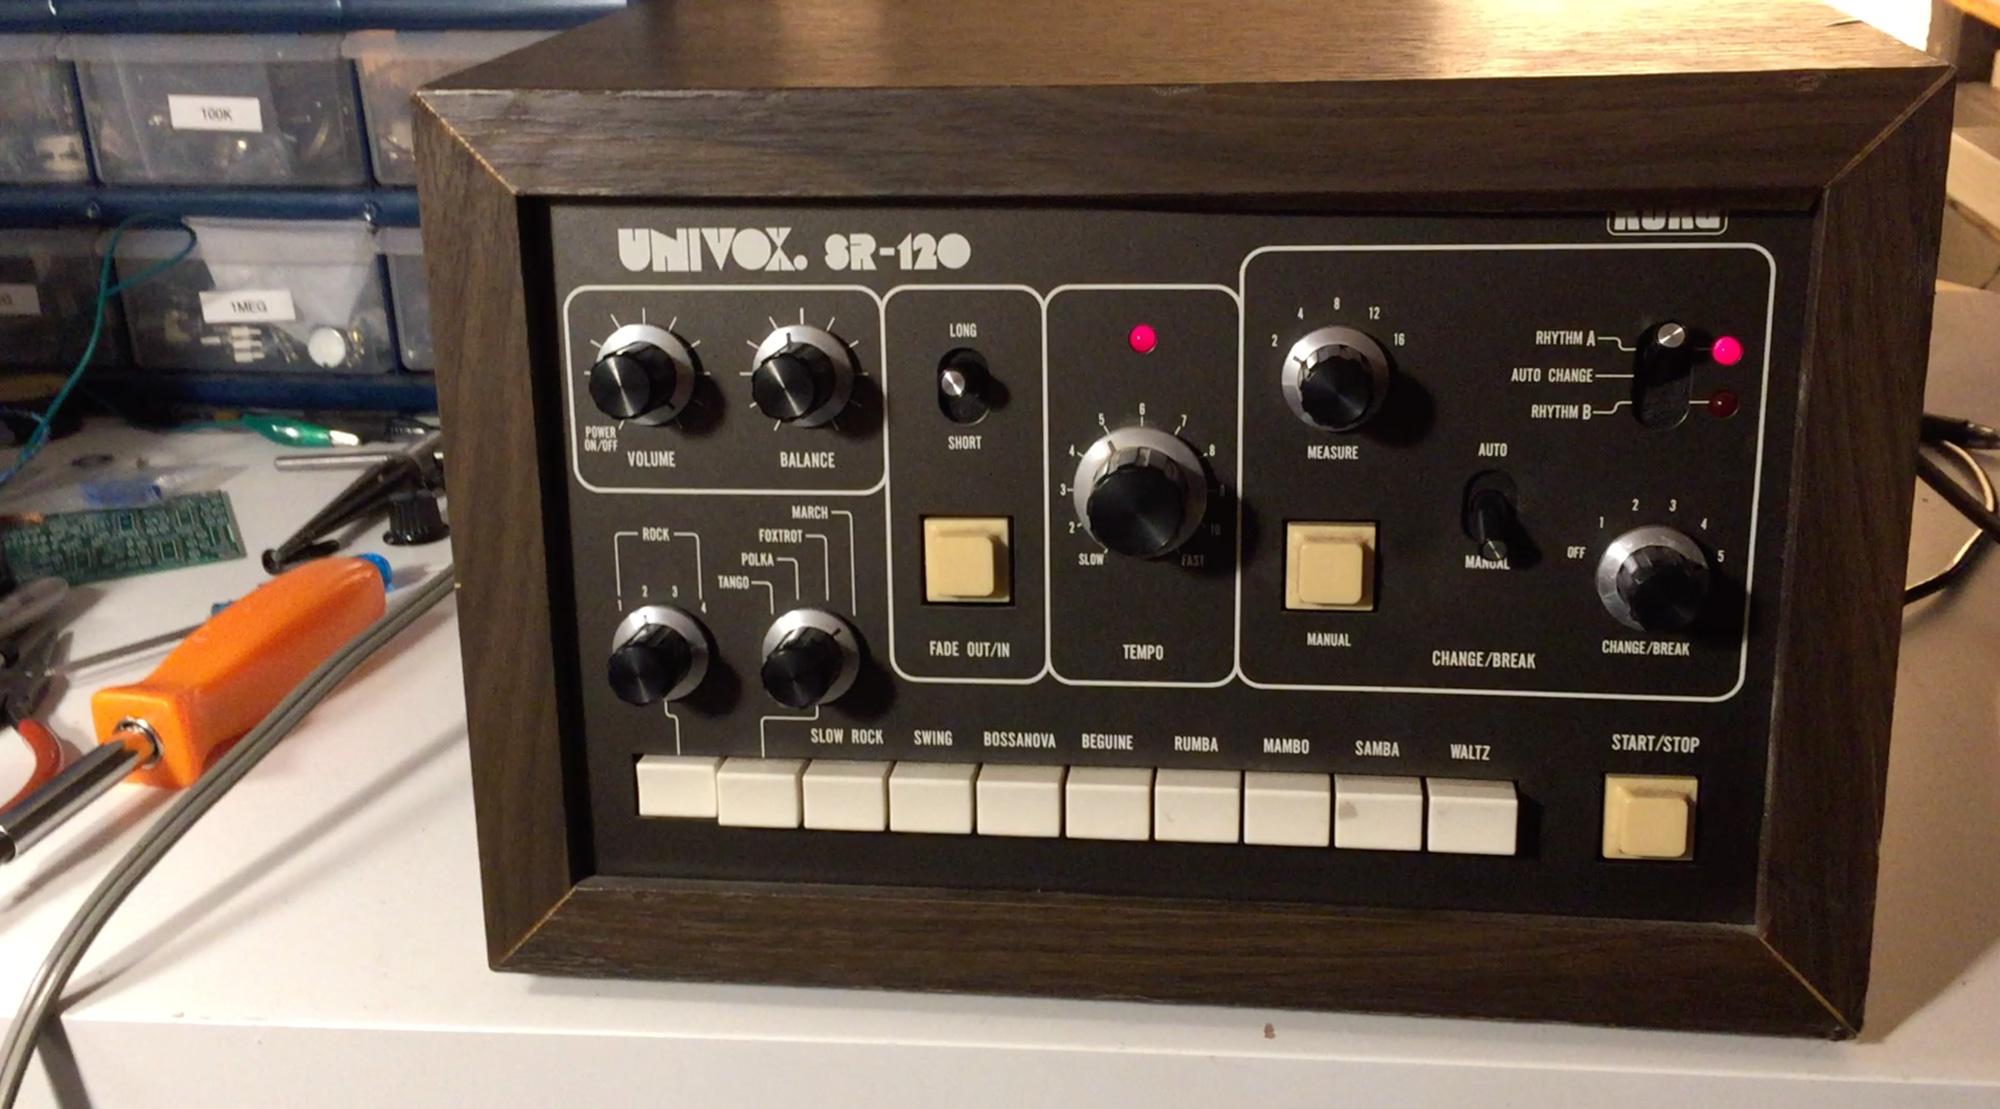 Univox SR-120 Drum Machine